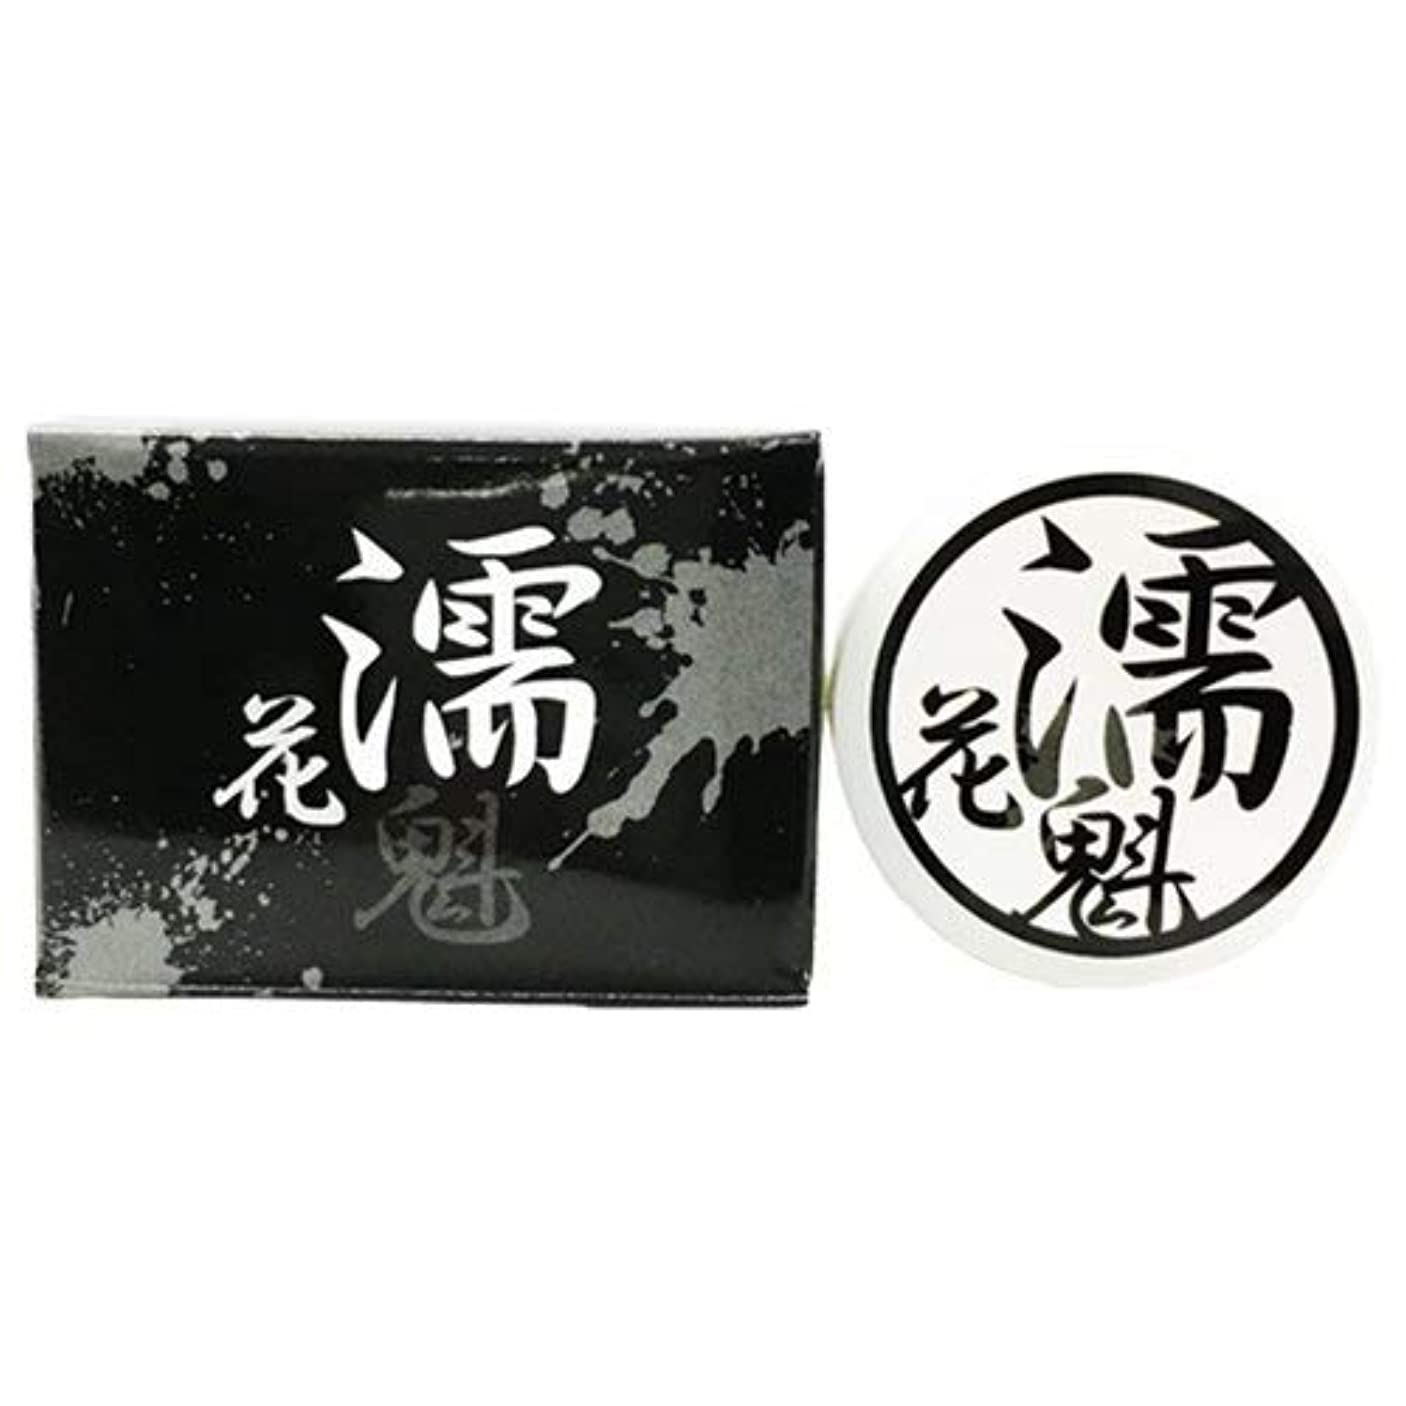 流暢識字スリーブ【※正規品※限定セール開催中!!】濡花魁 (5)